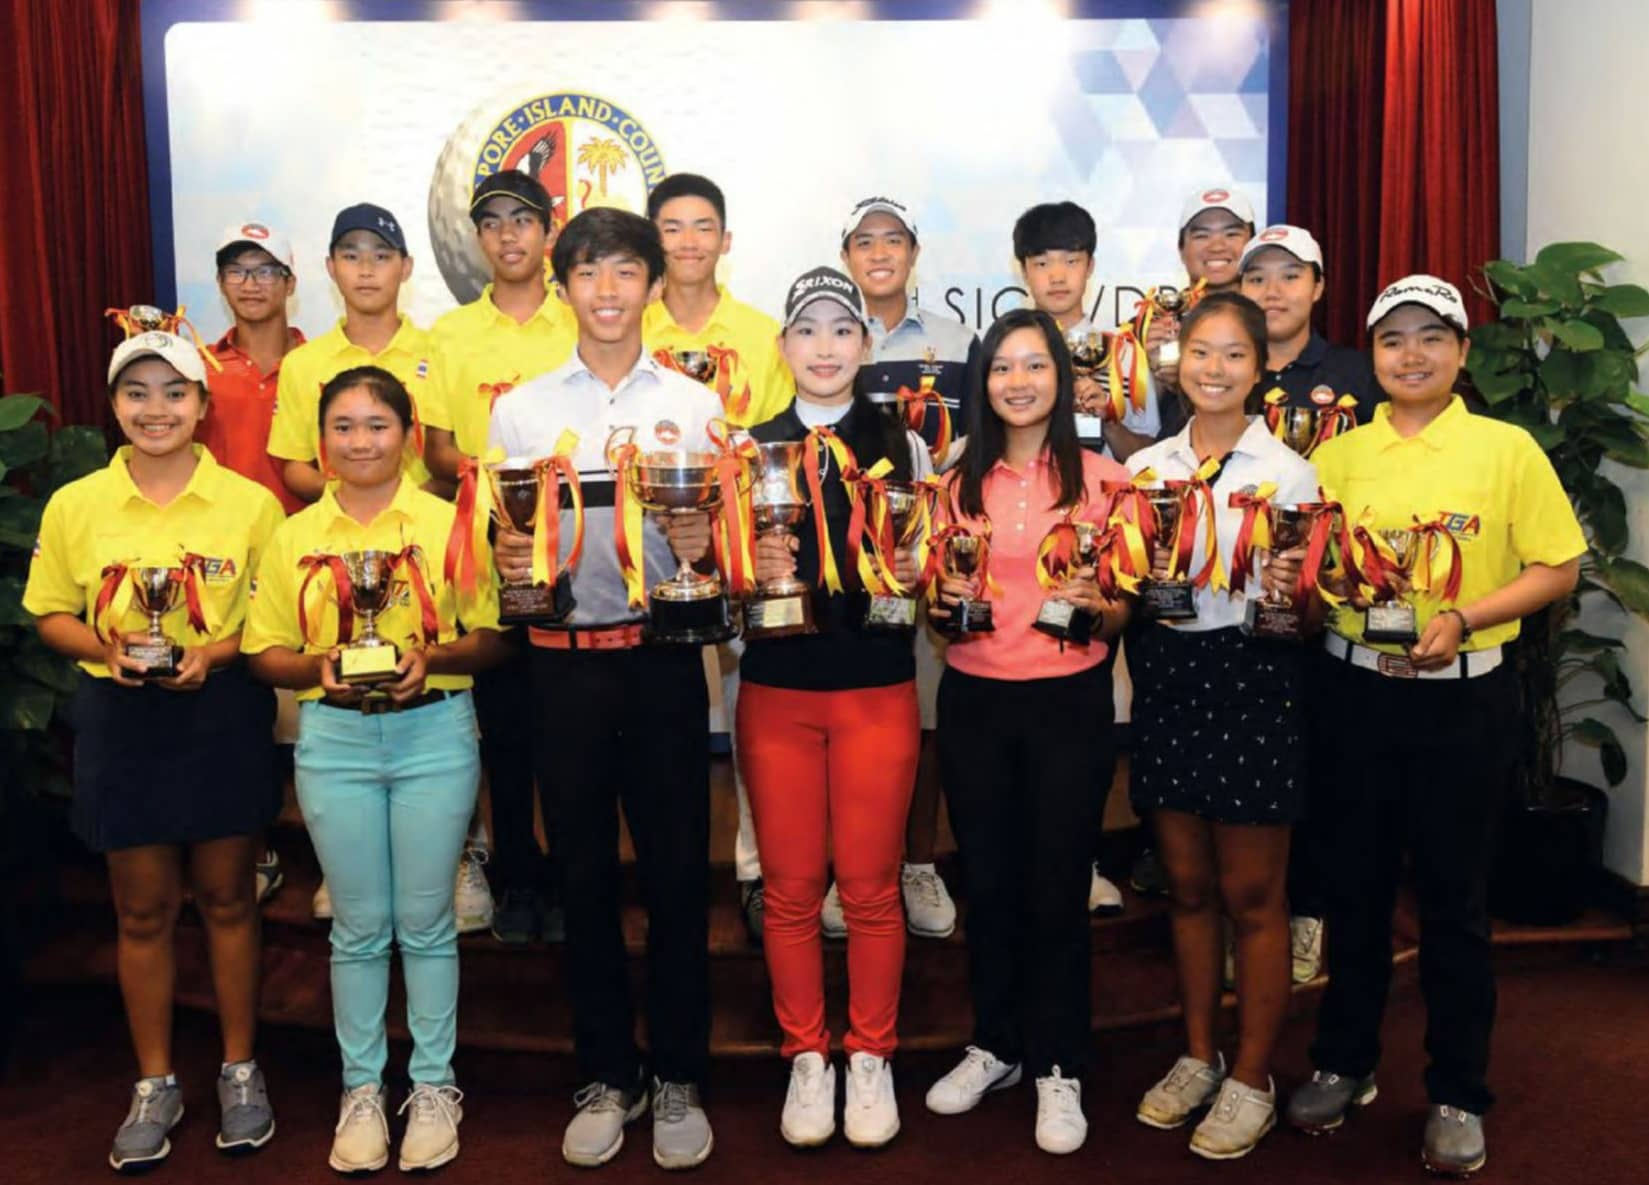 28th SICC/ DBS Junior Invitational Golf Championship